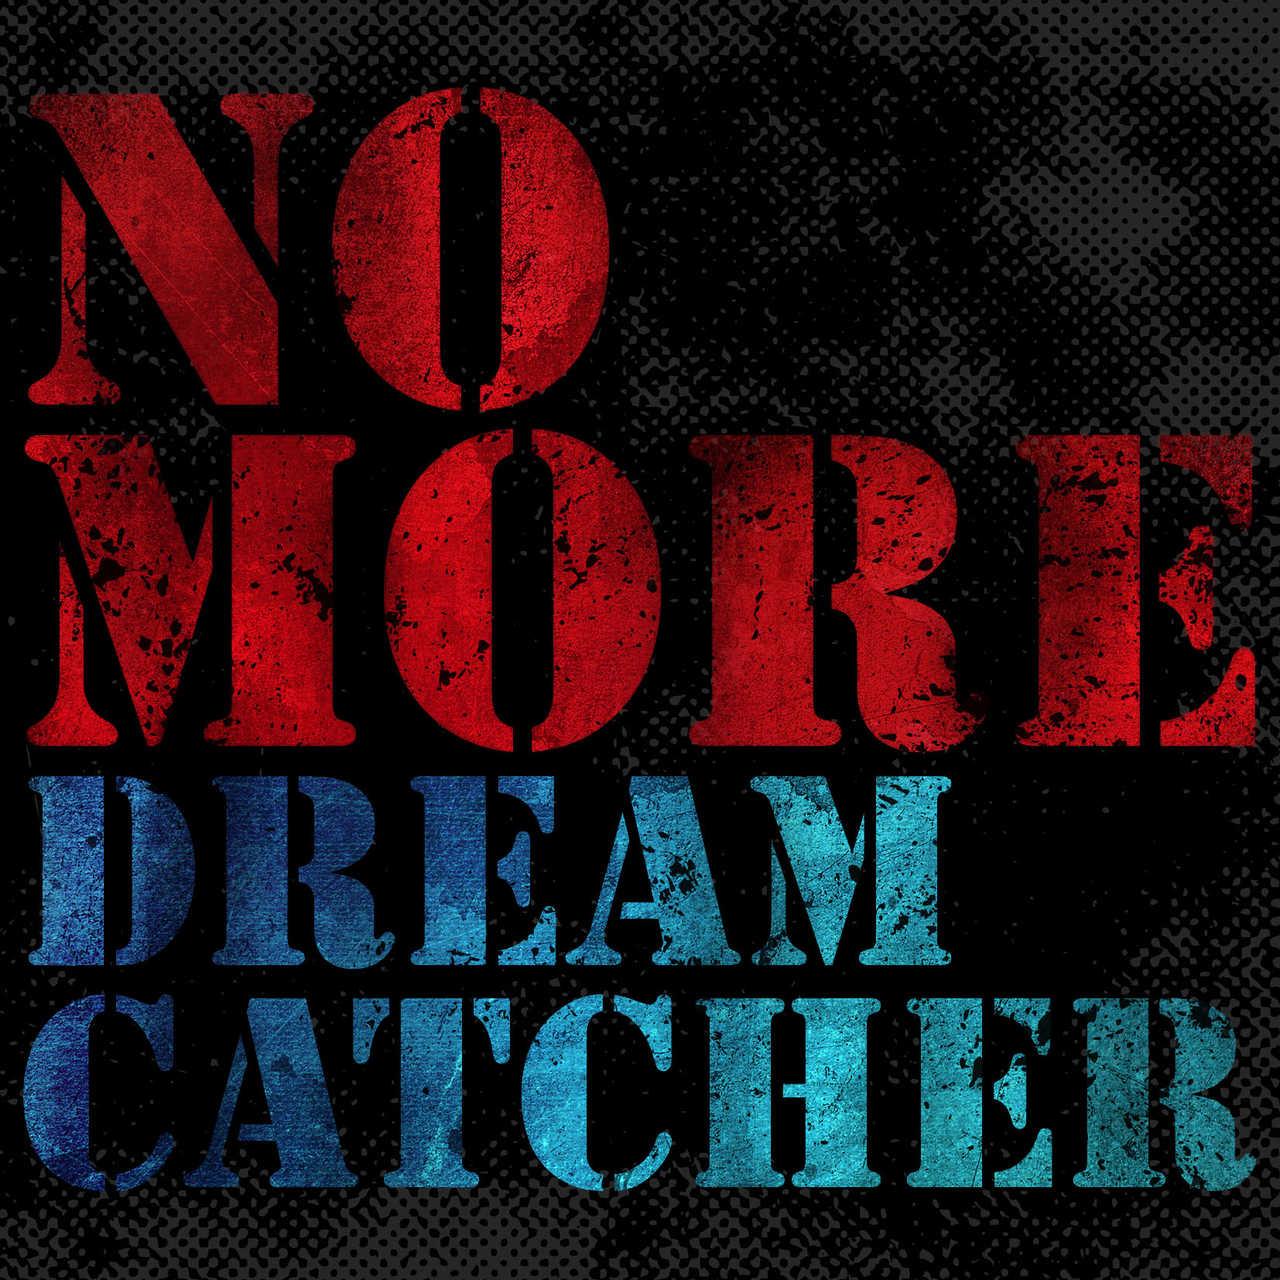 DREAMCATCHER「NO MORE」は、SNS上の誹謗中傷に立ち向かう力強い歌詞が魅力的!